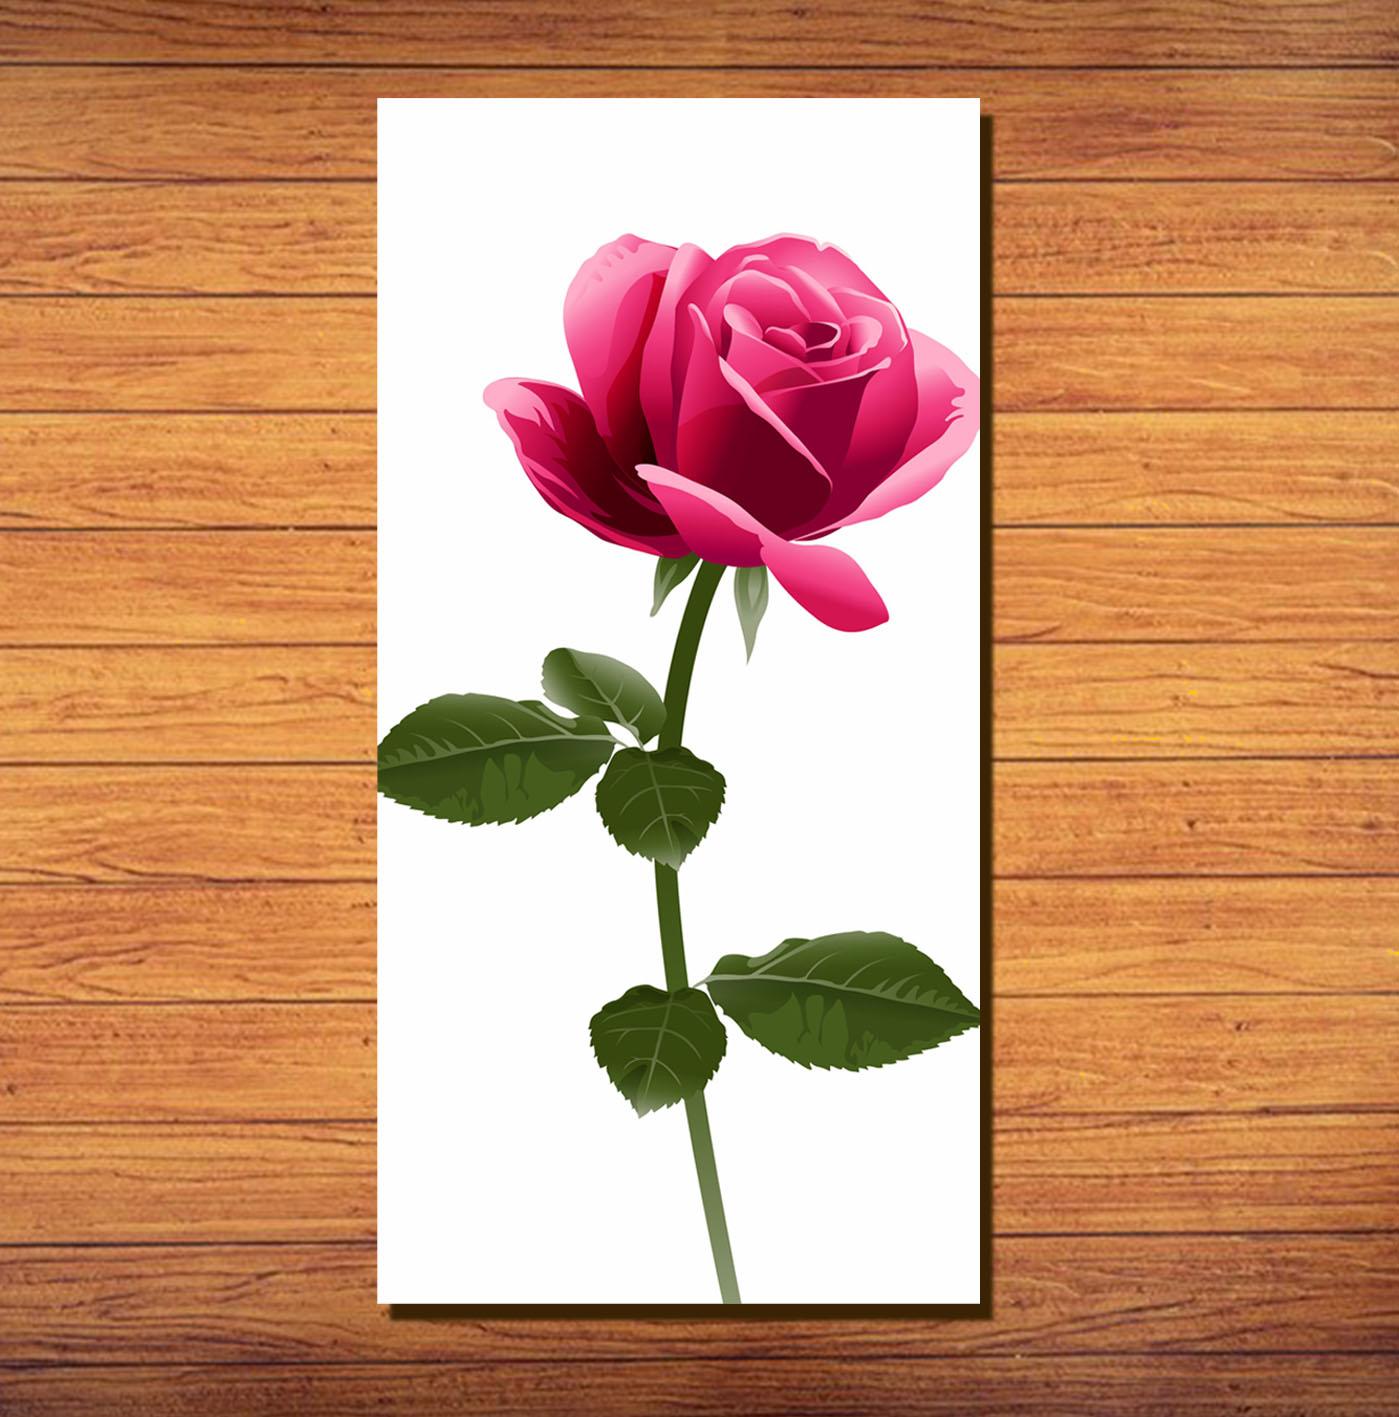 Dekorasi Rumah Hiasan Kamar Hiasan Dinding Mawar Merah Pink